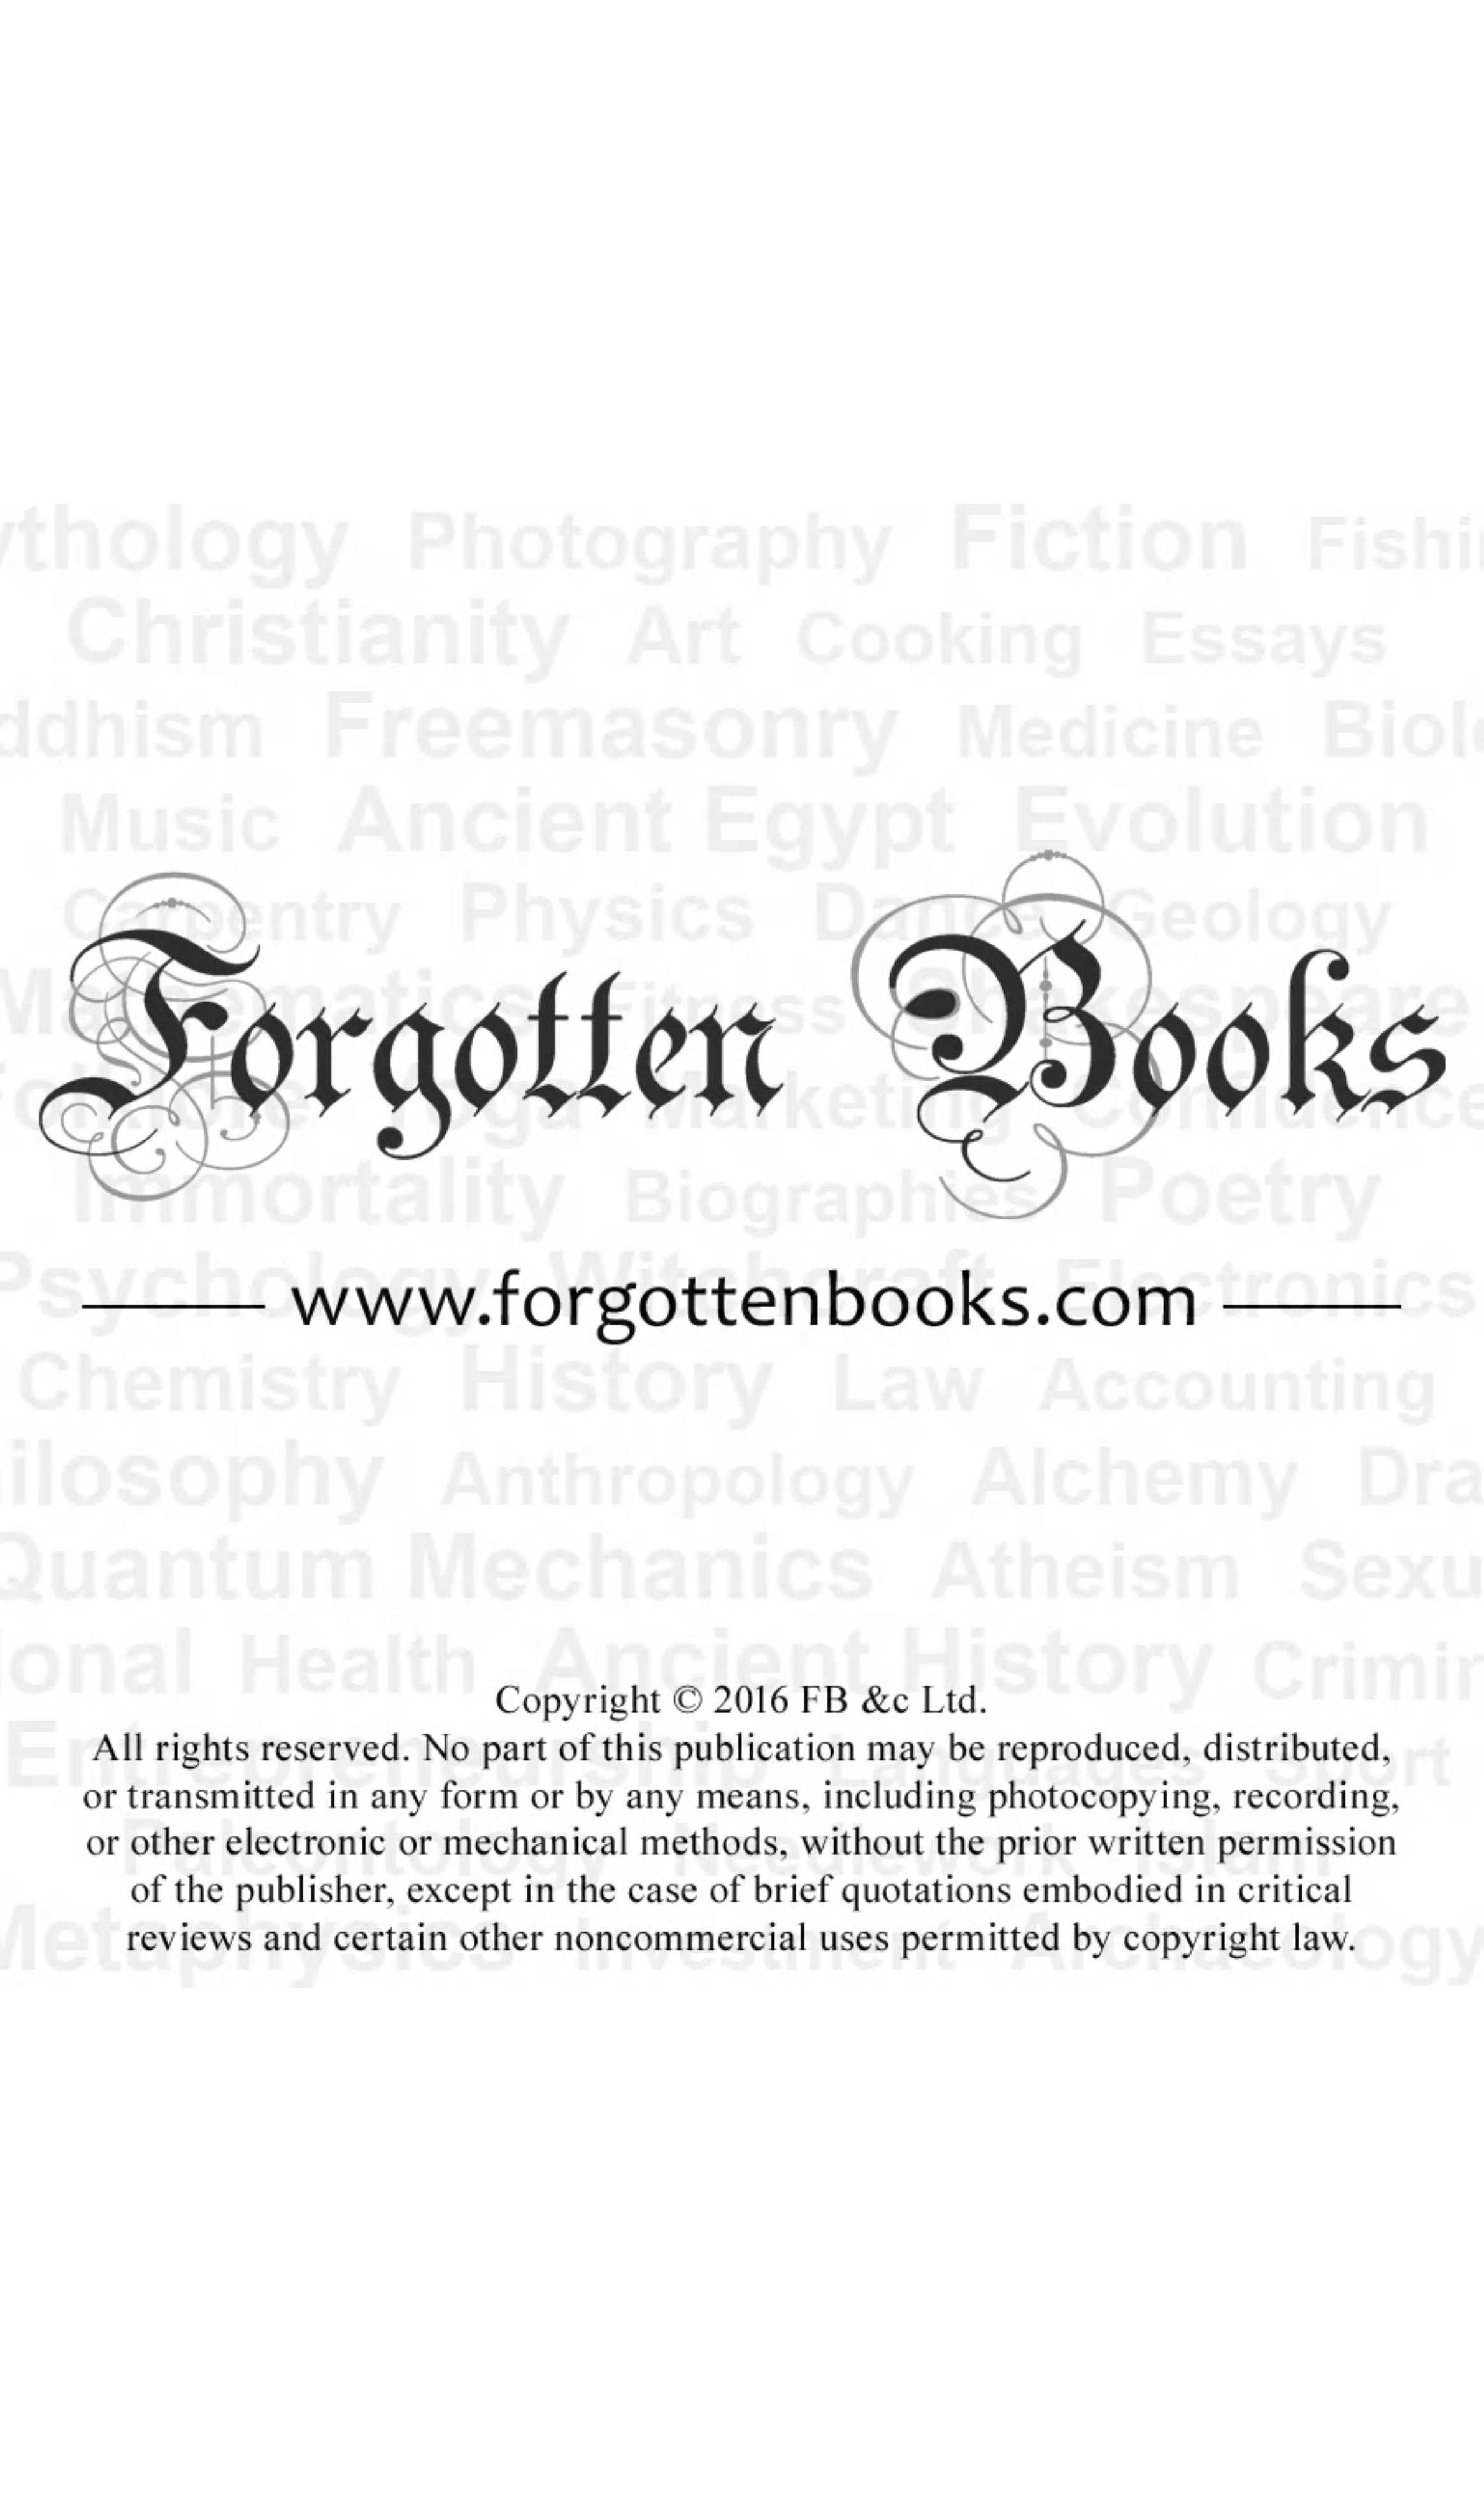 Untitled Forgotten Books  